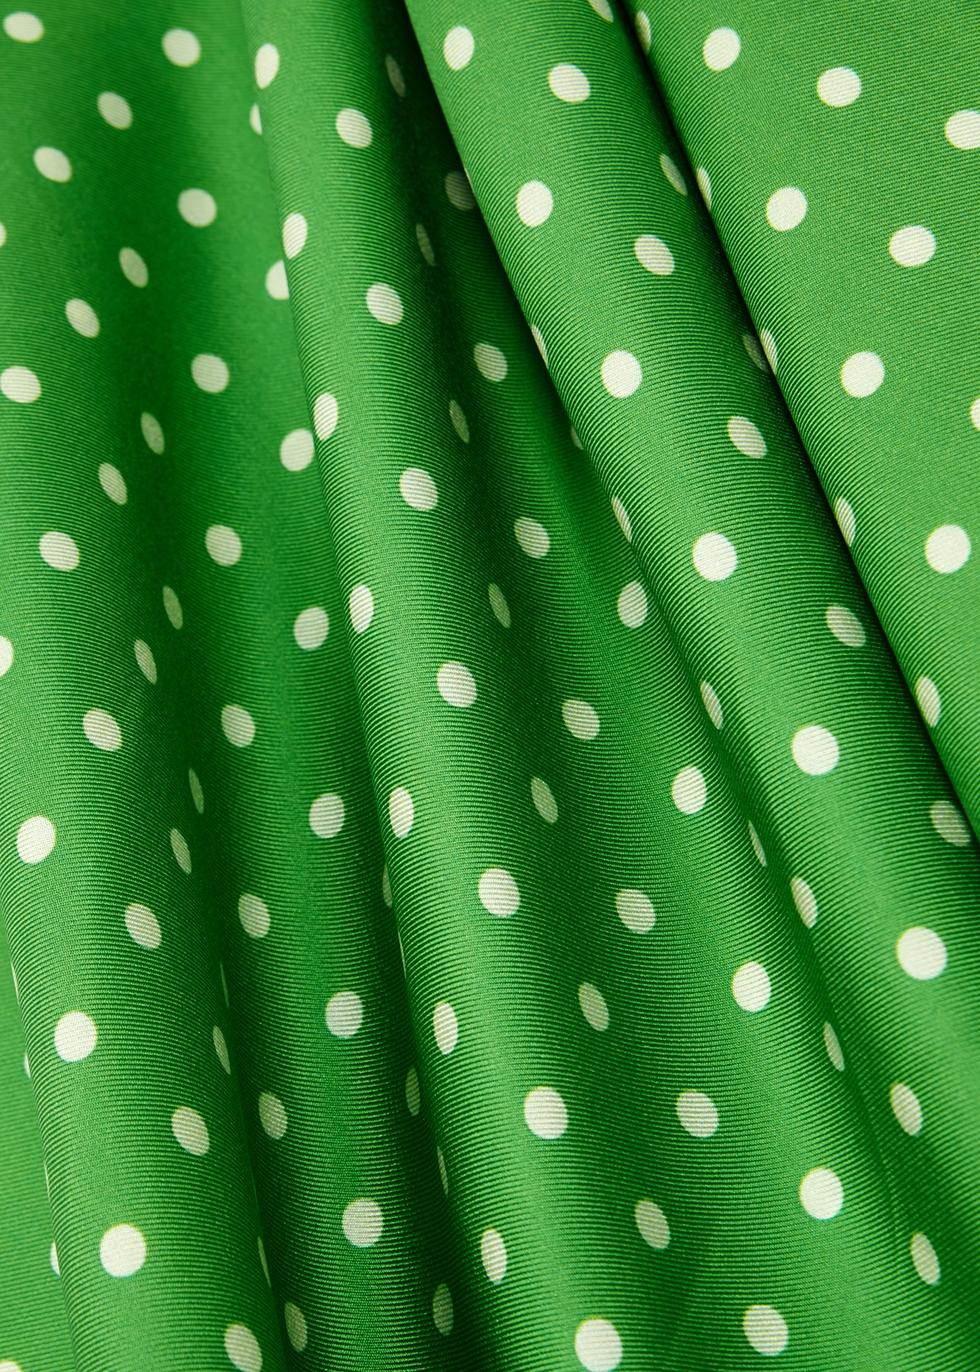 Polka-dot silk slip dress - Walk of Shame